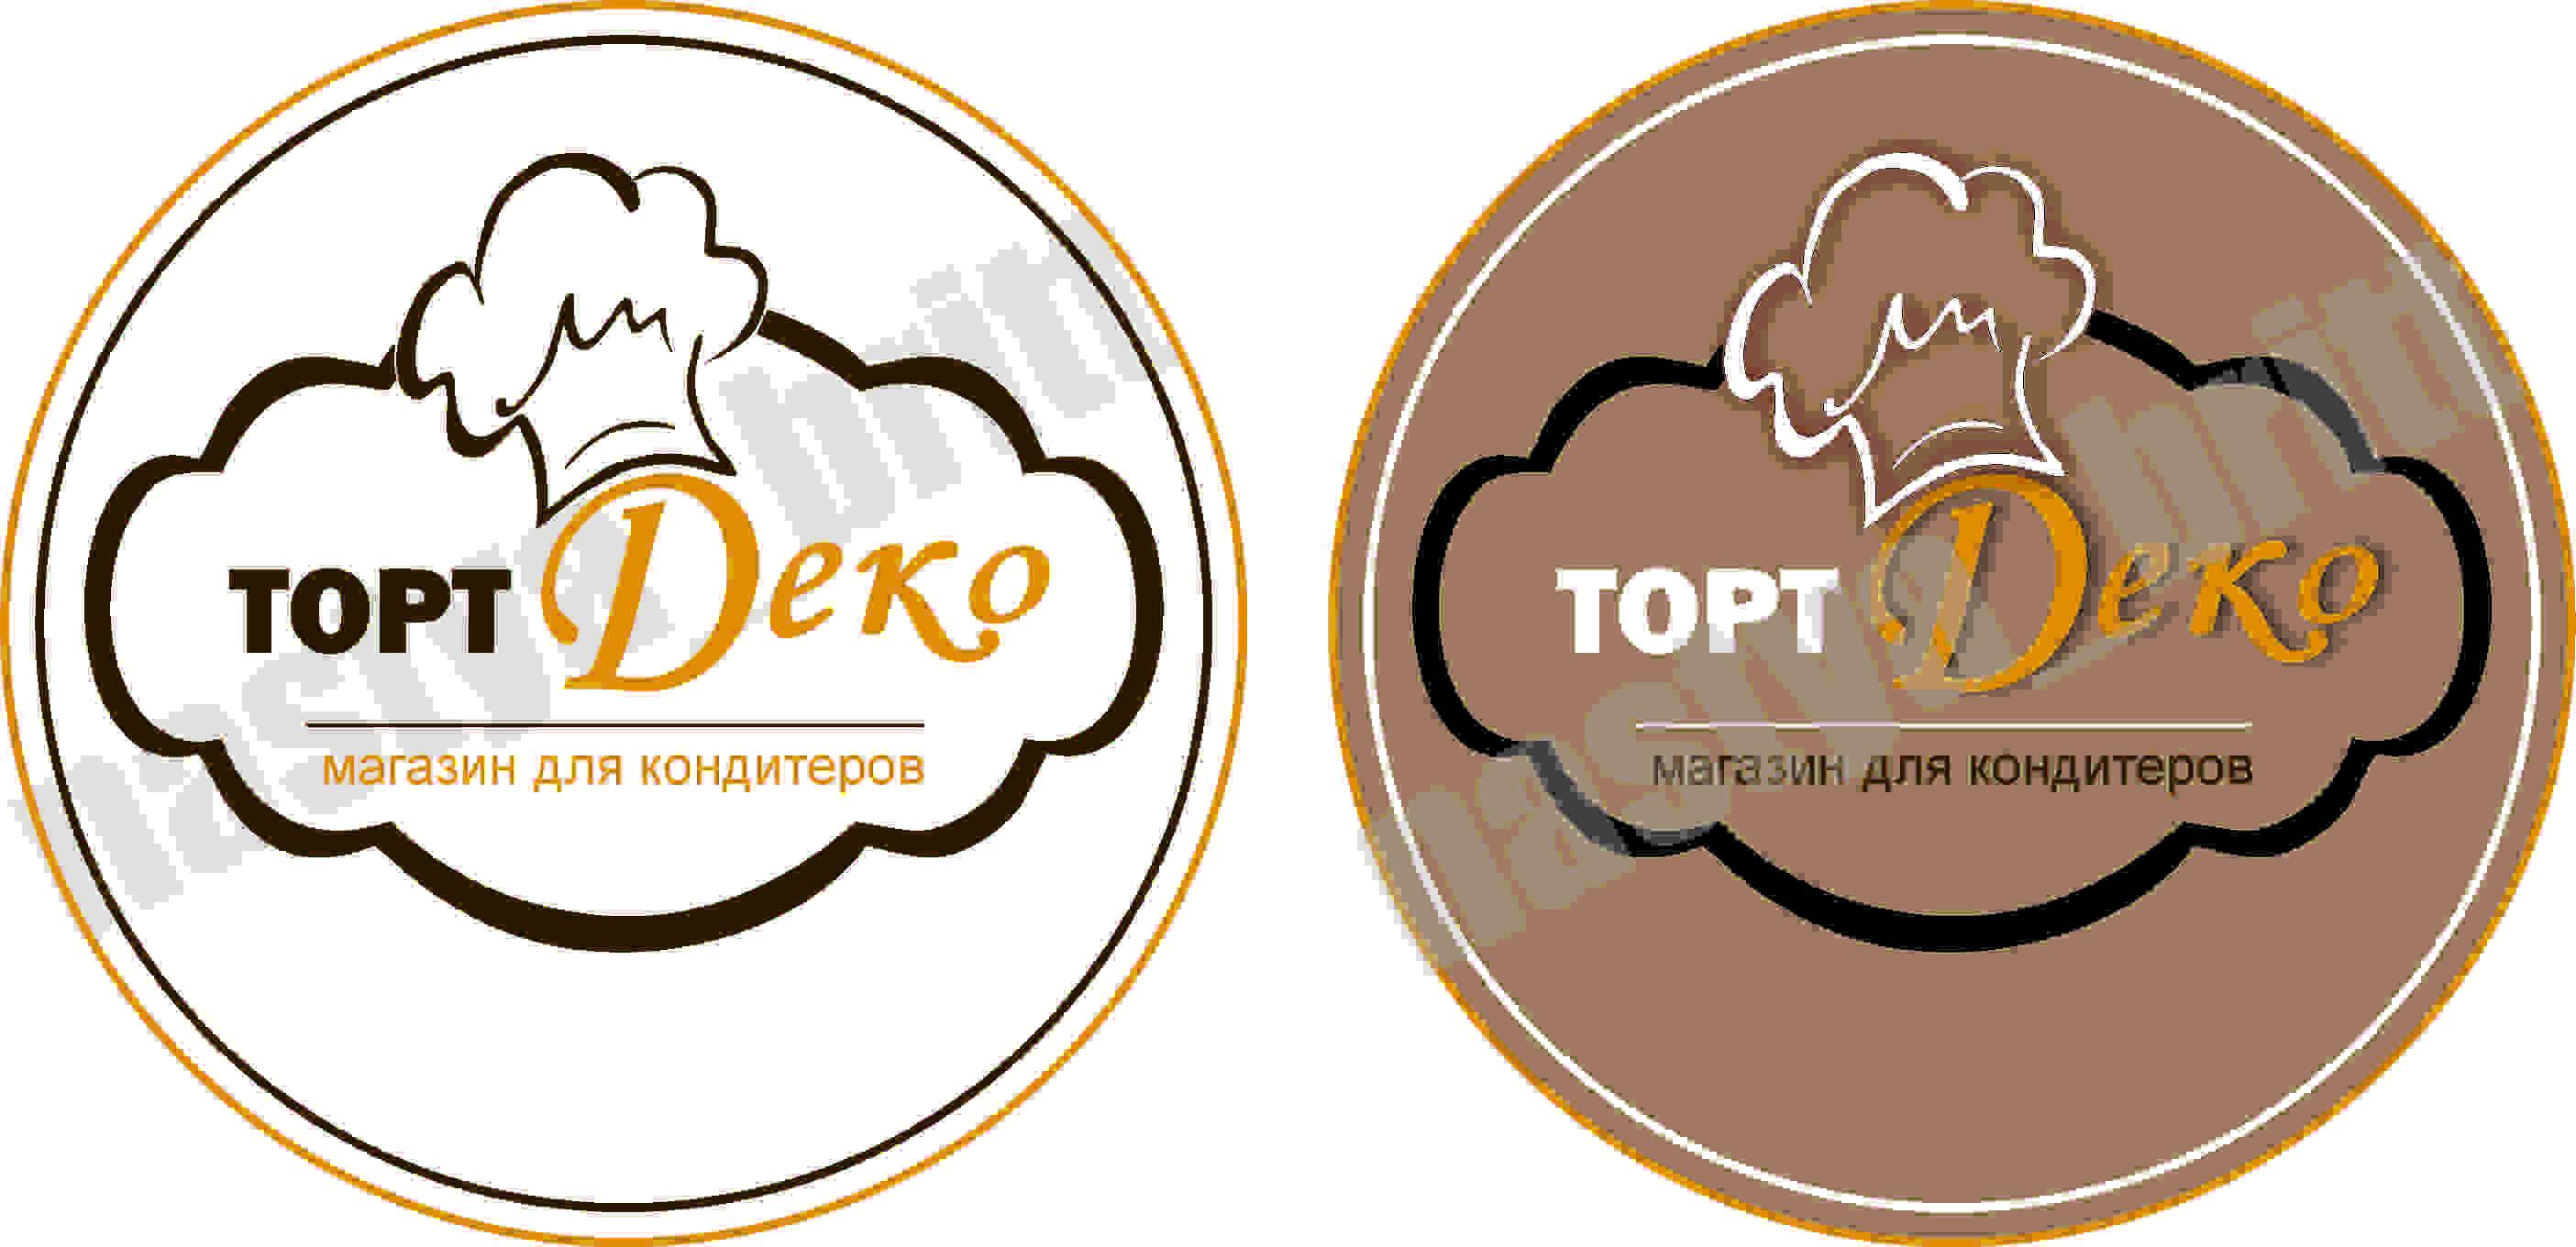 Логотип для магазина для кондитеров фото f_9735f1c0182d5e42.jpg